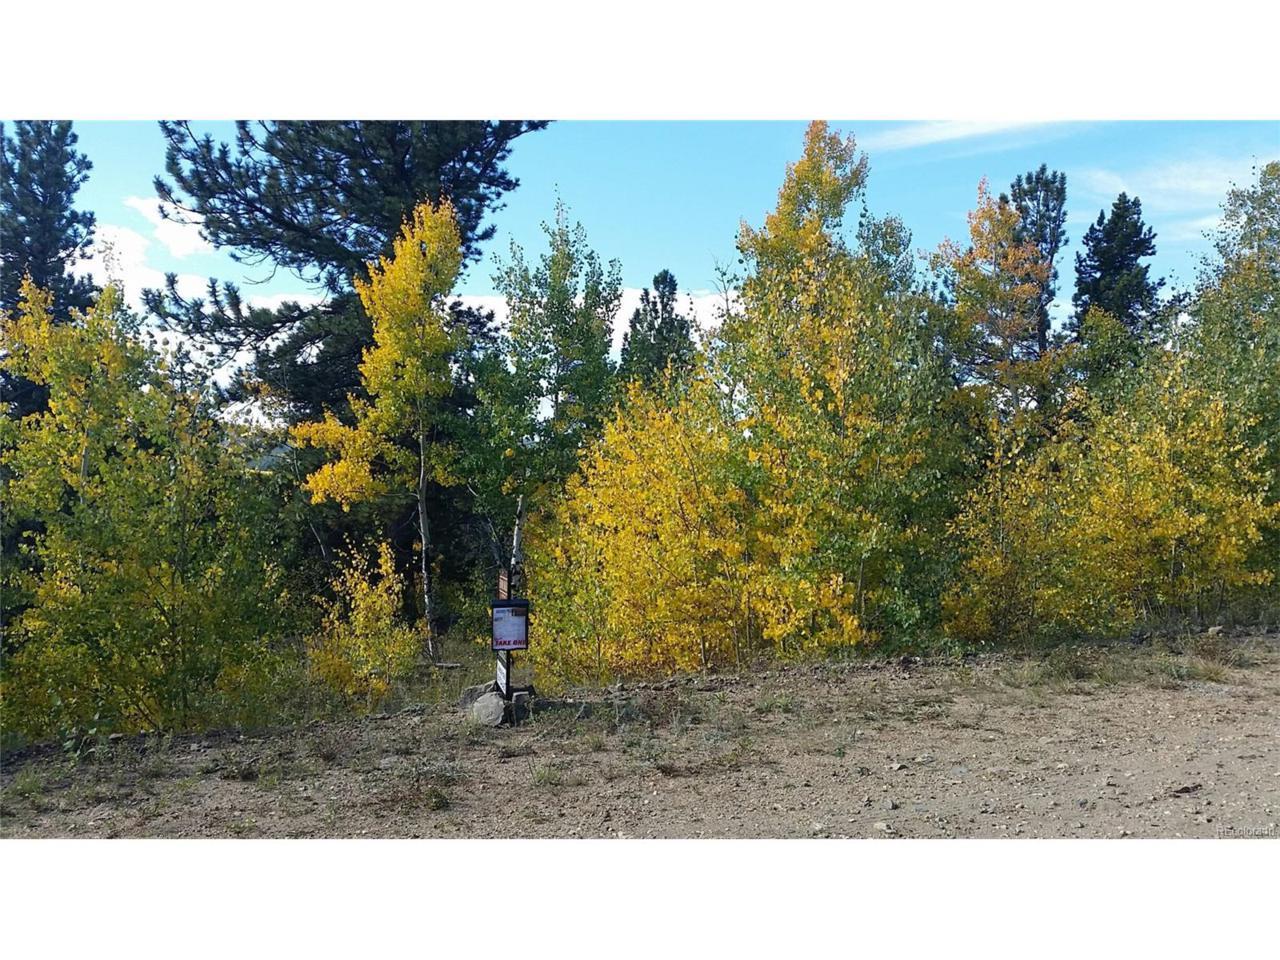 48 Pickle Point, Black Hawk, CO 80422 (MLS #8415533) :: 8z Real Estate